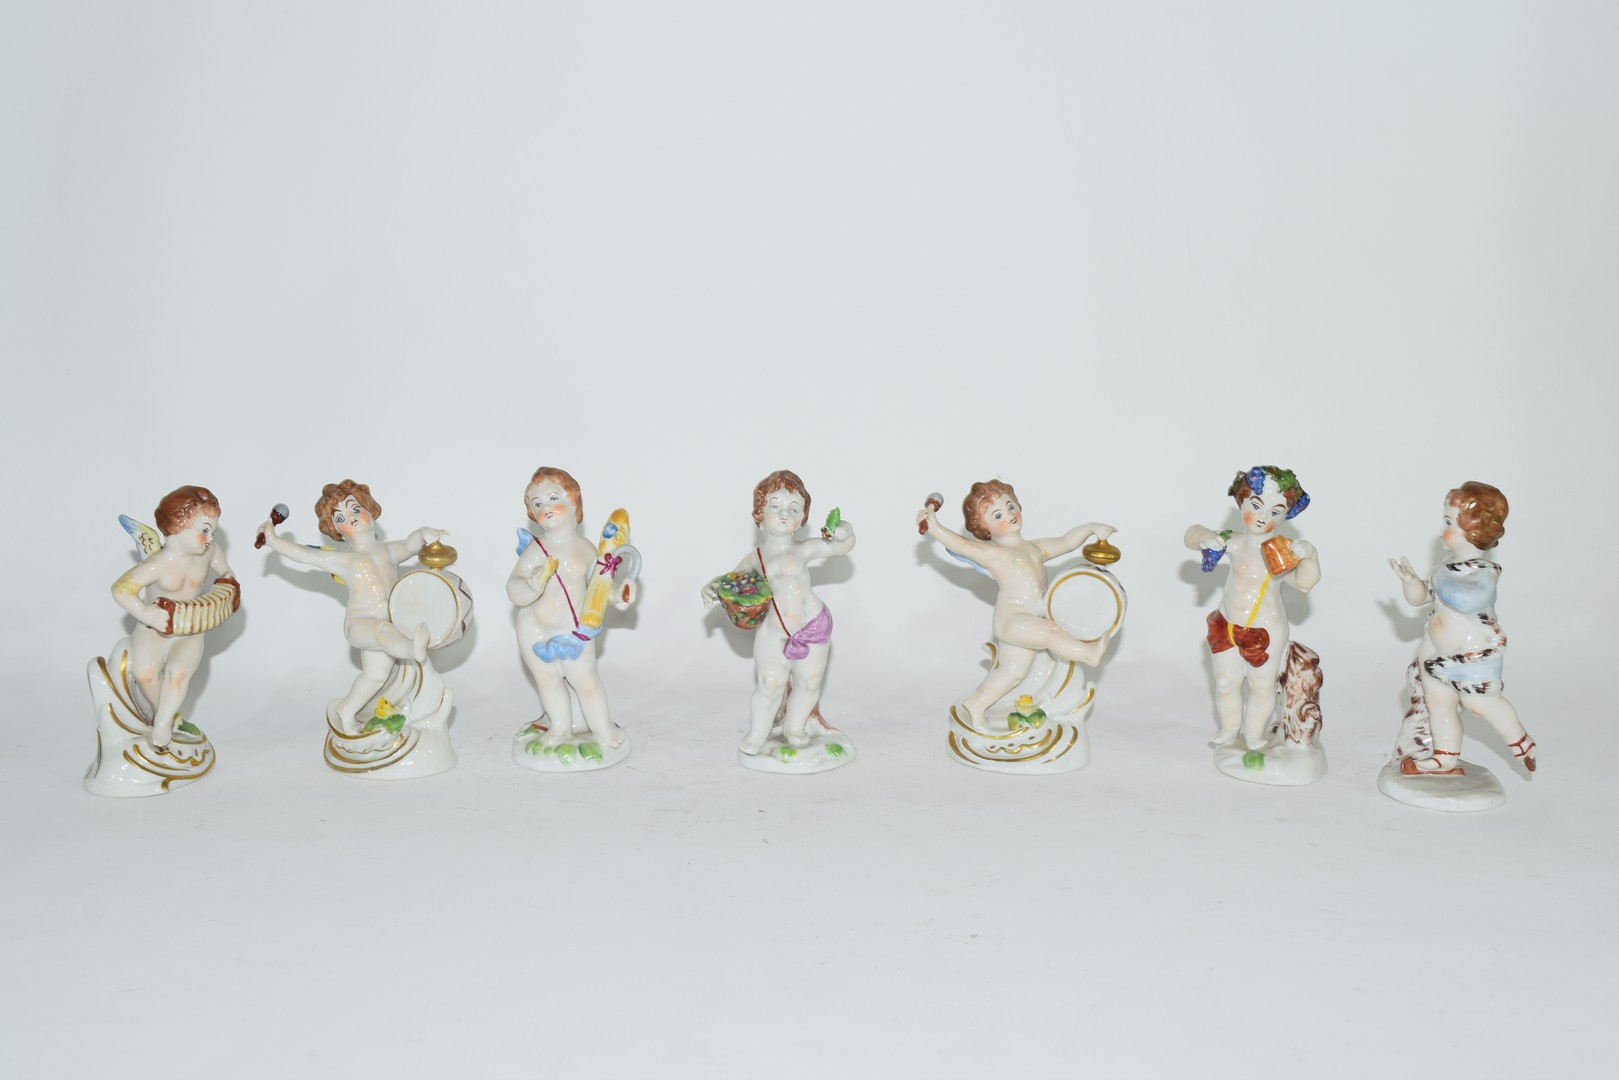 Group of Naples porcelain figures